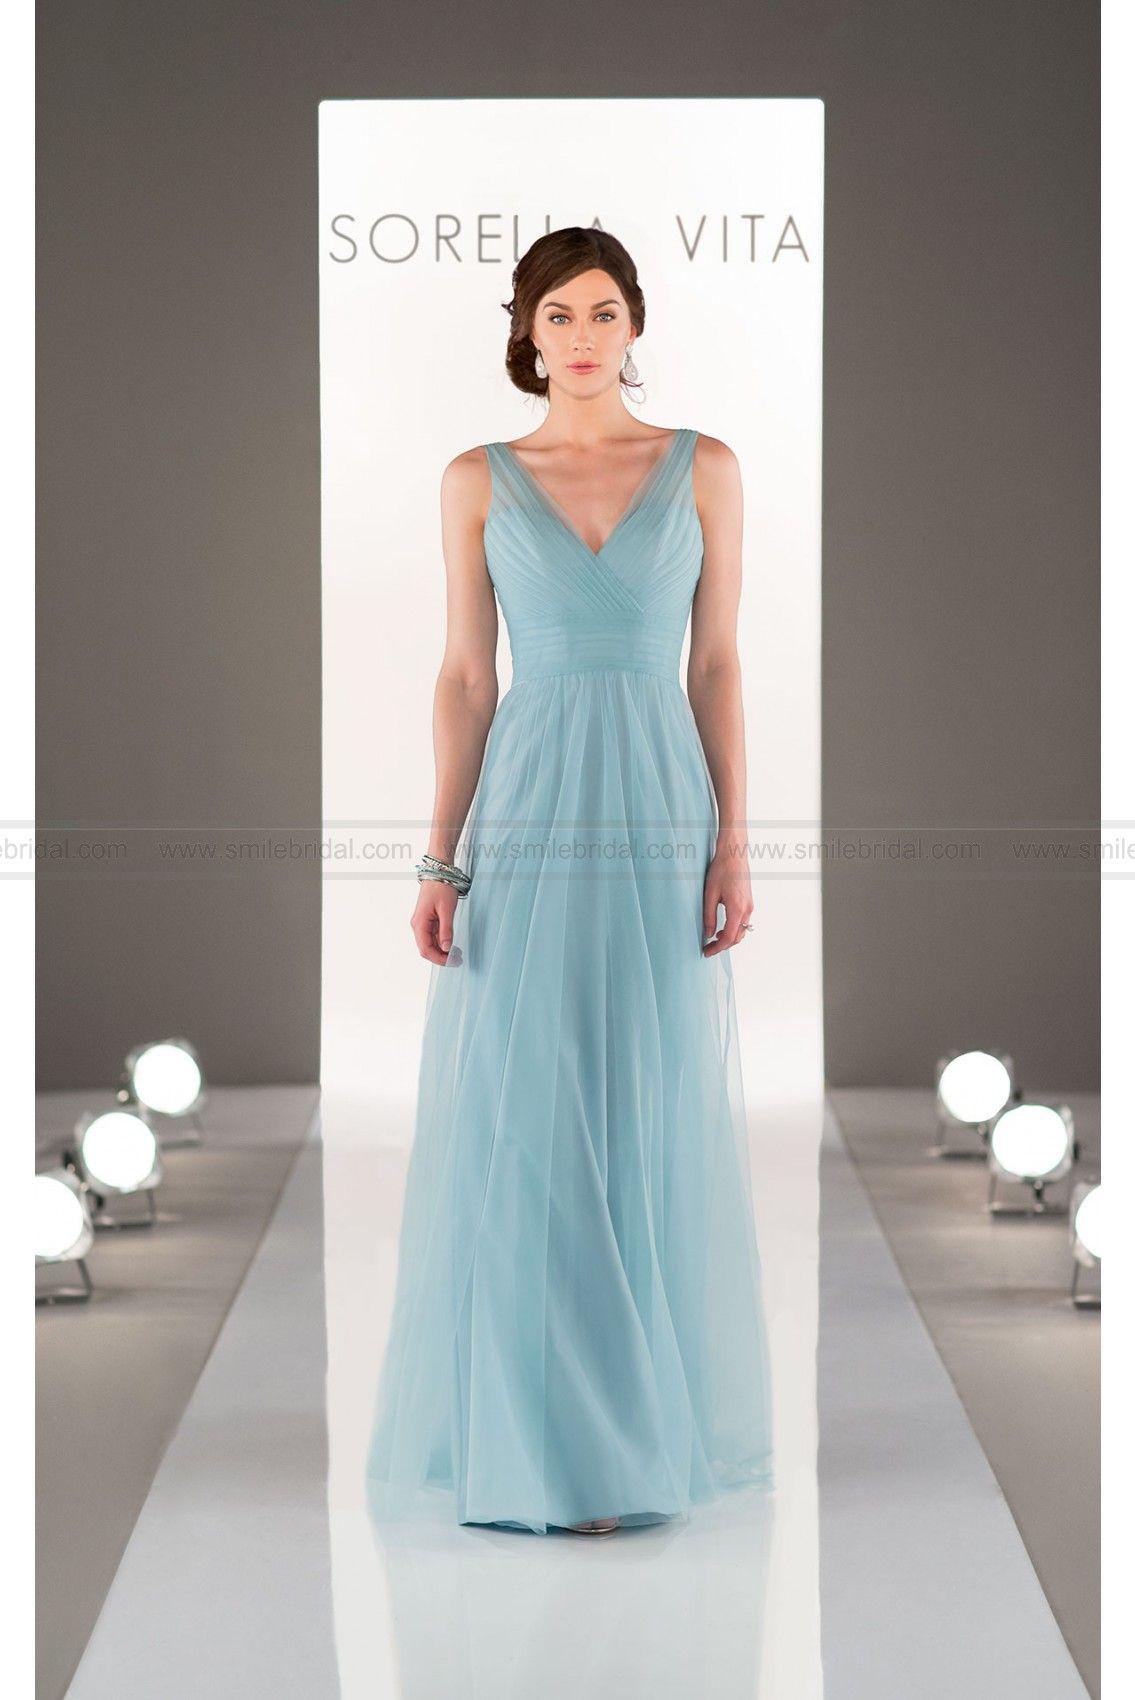 Sorella vita tulle bridesmaid dress style bridesmaid dress